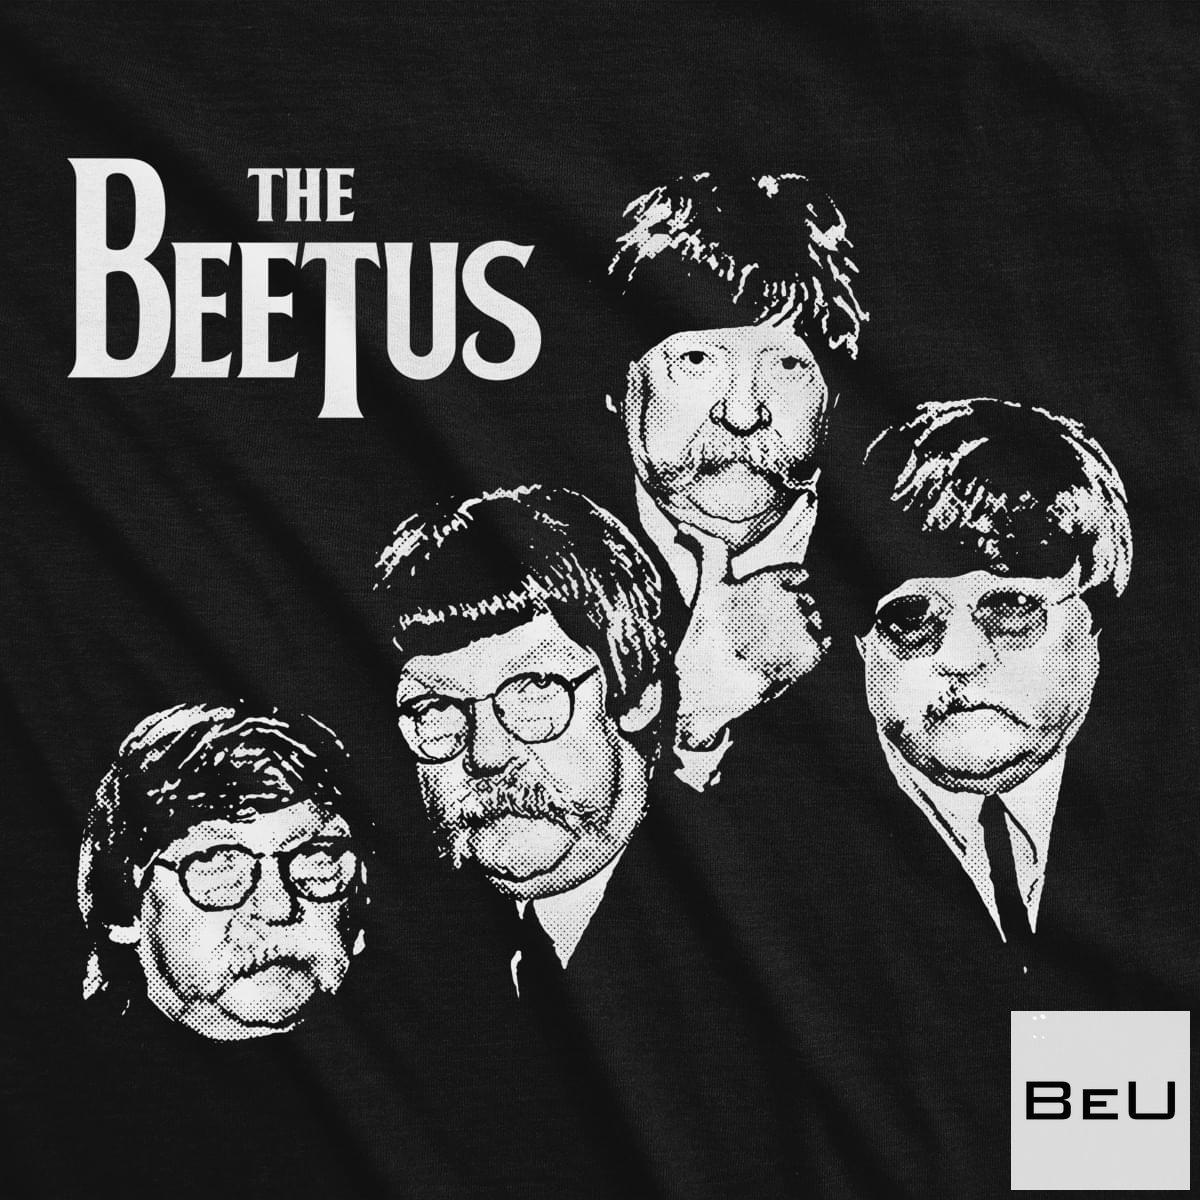 The Beetus Shirt